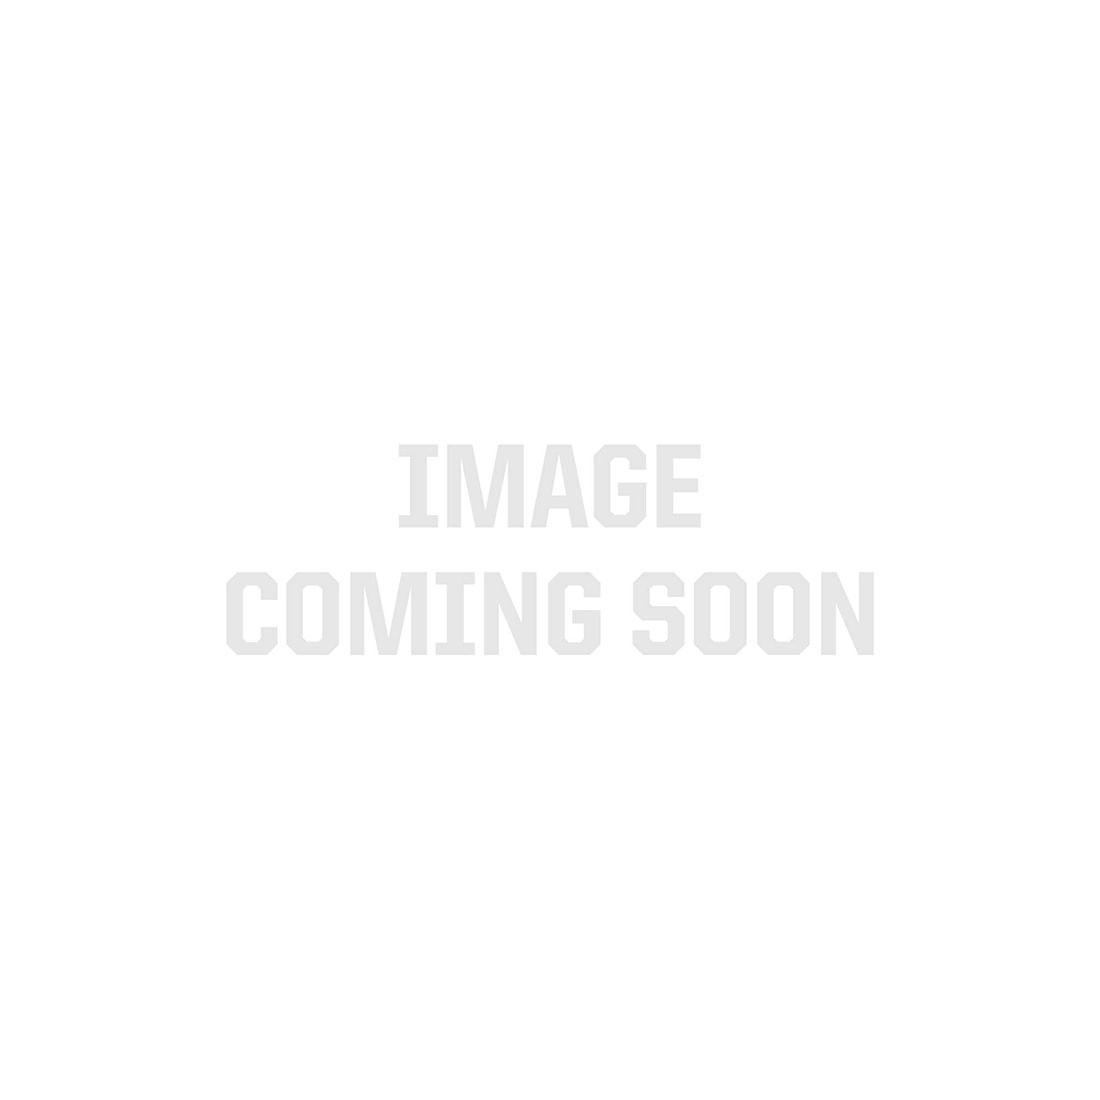 Customizable Shelf Light Bar - 3,500K - 16 LEDs - 280mm